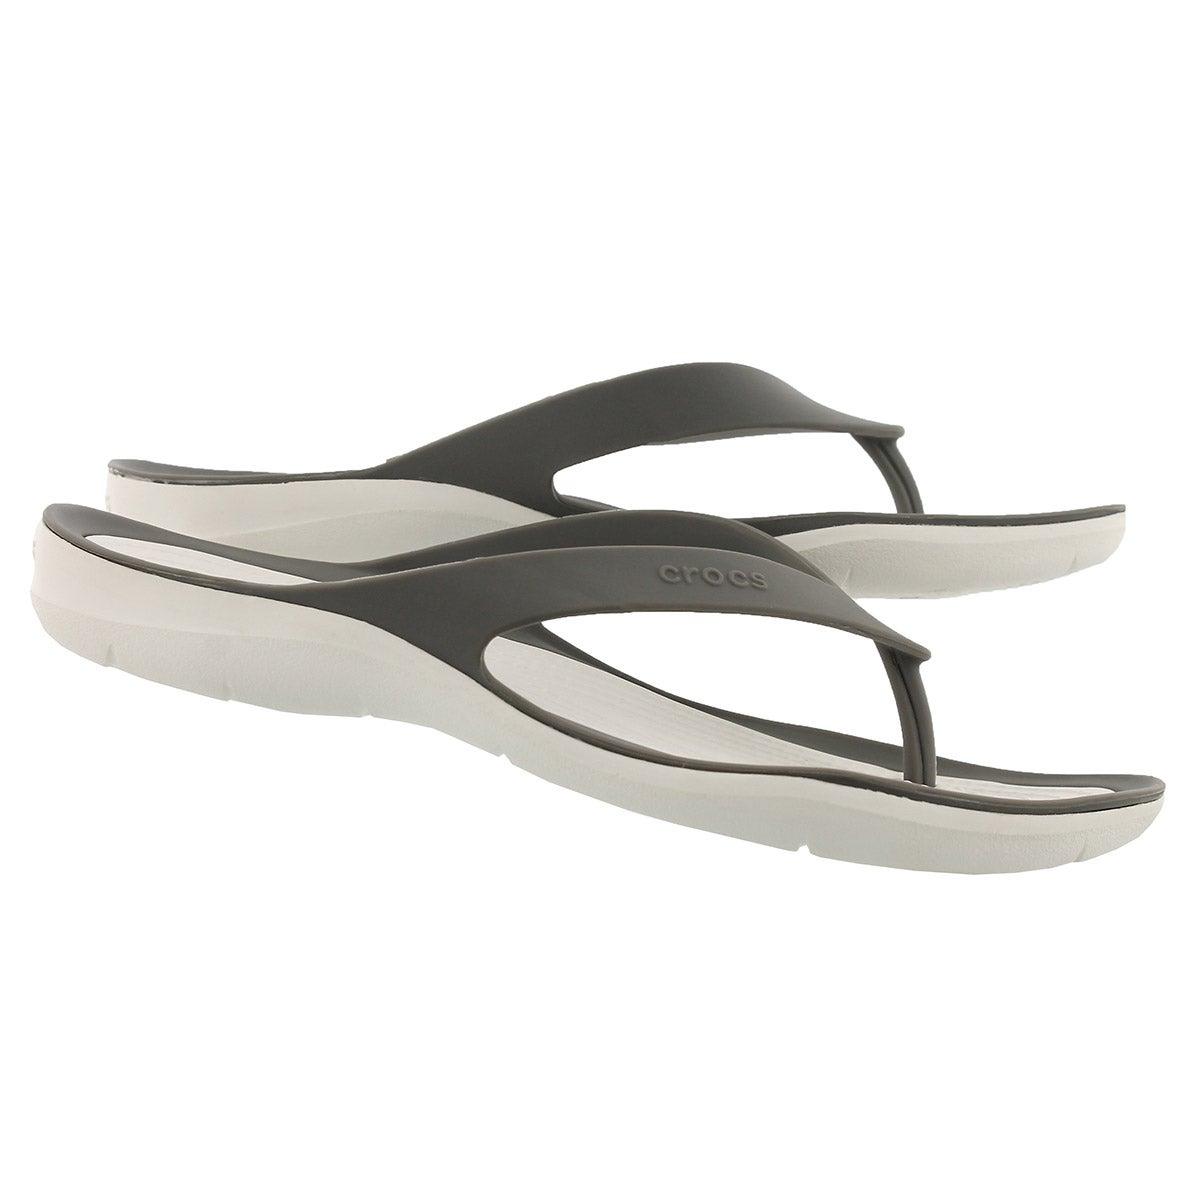 Sandales tongs SWIFTWATER FLIP, fumée/blanc, femme